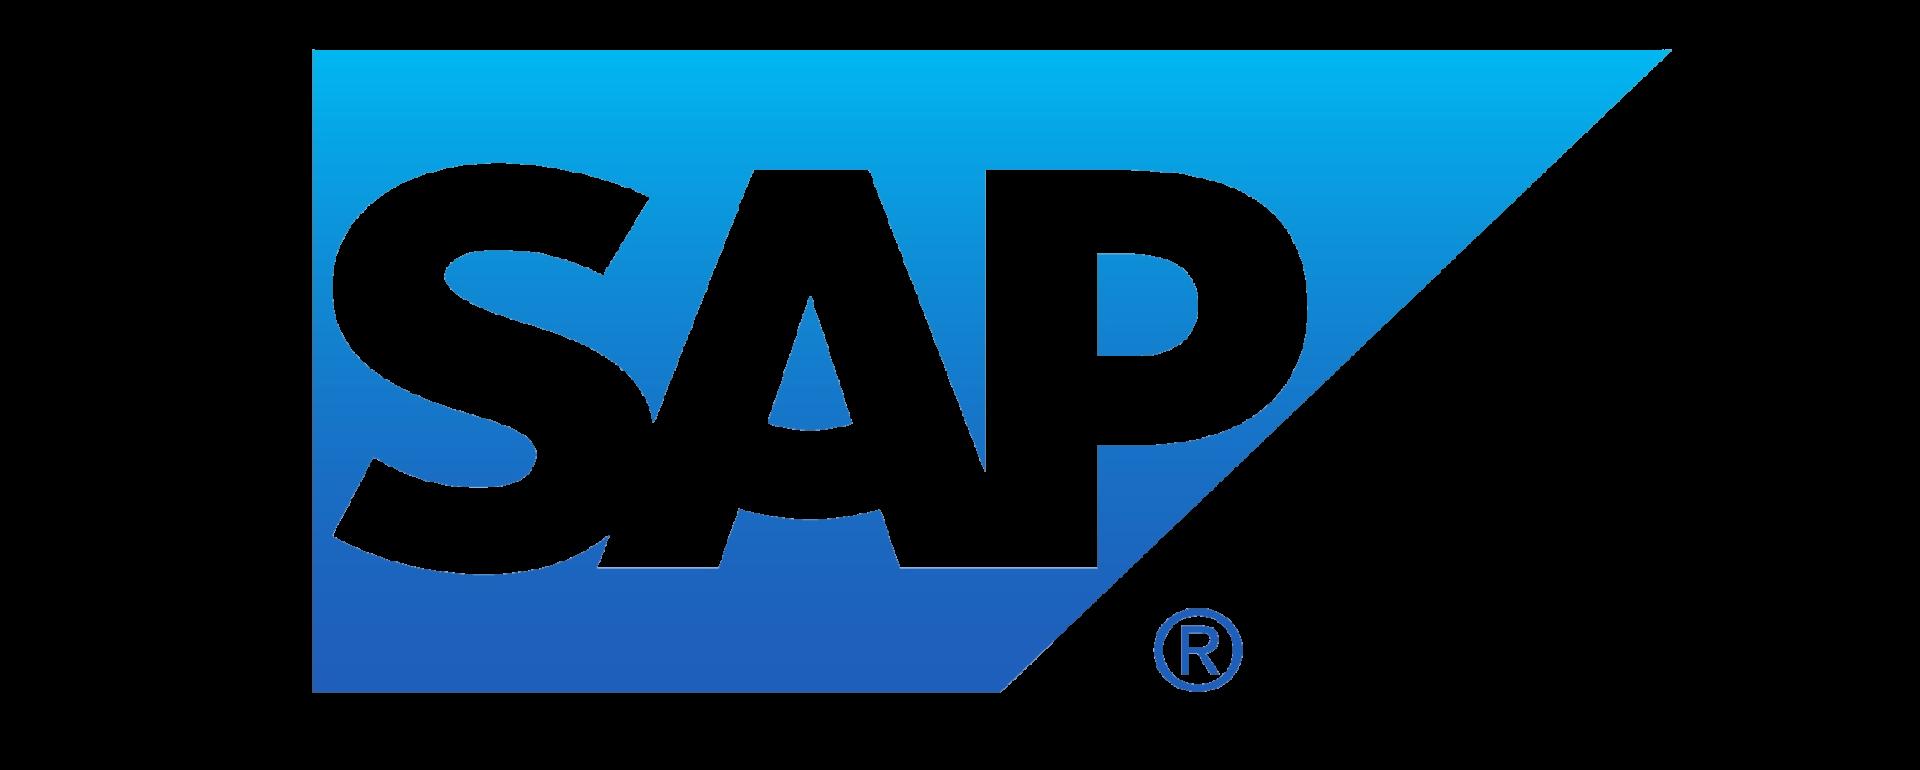 https://www.sap.com/poland/index.html